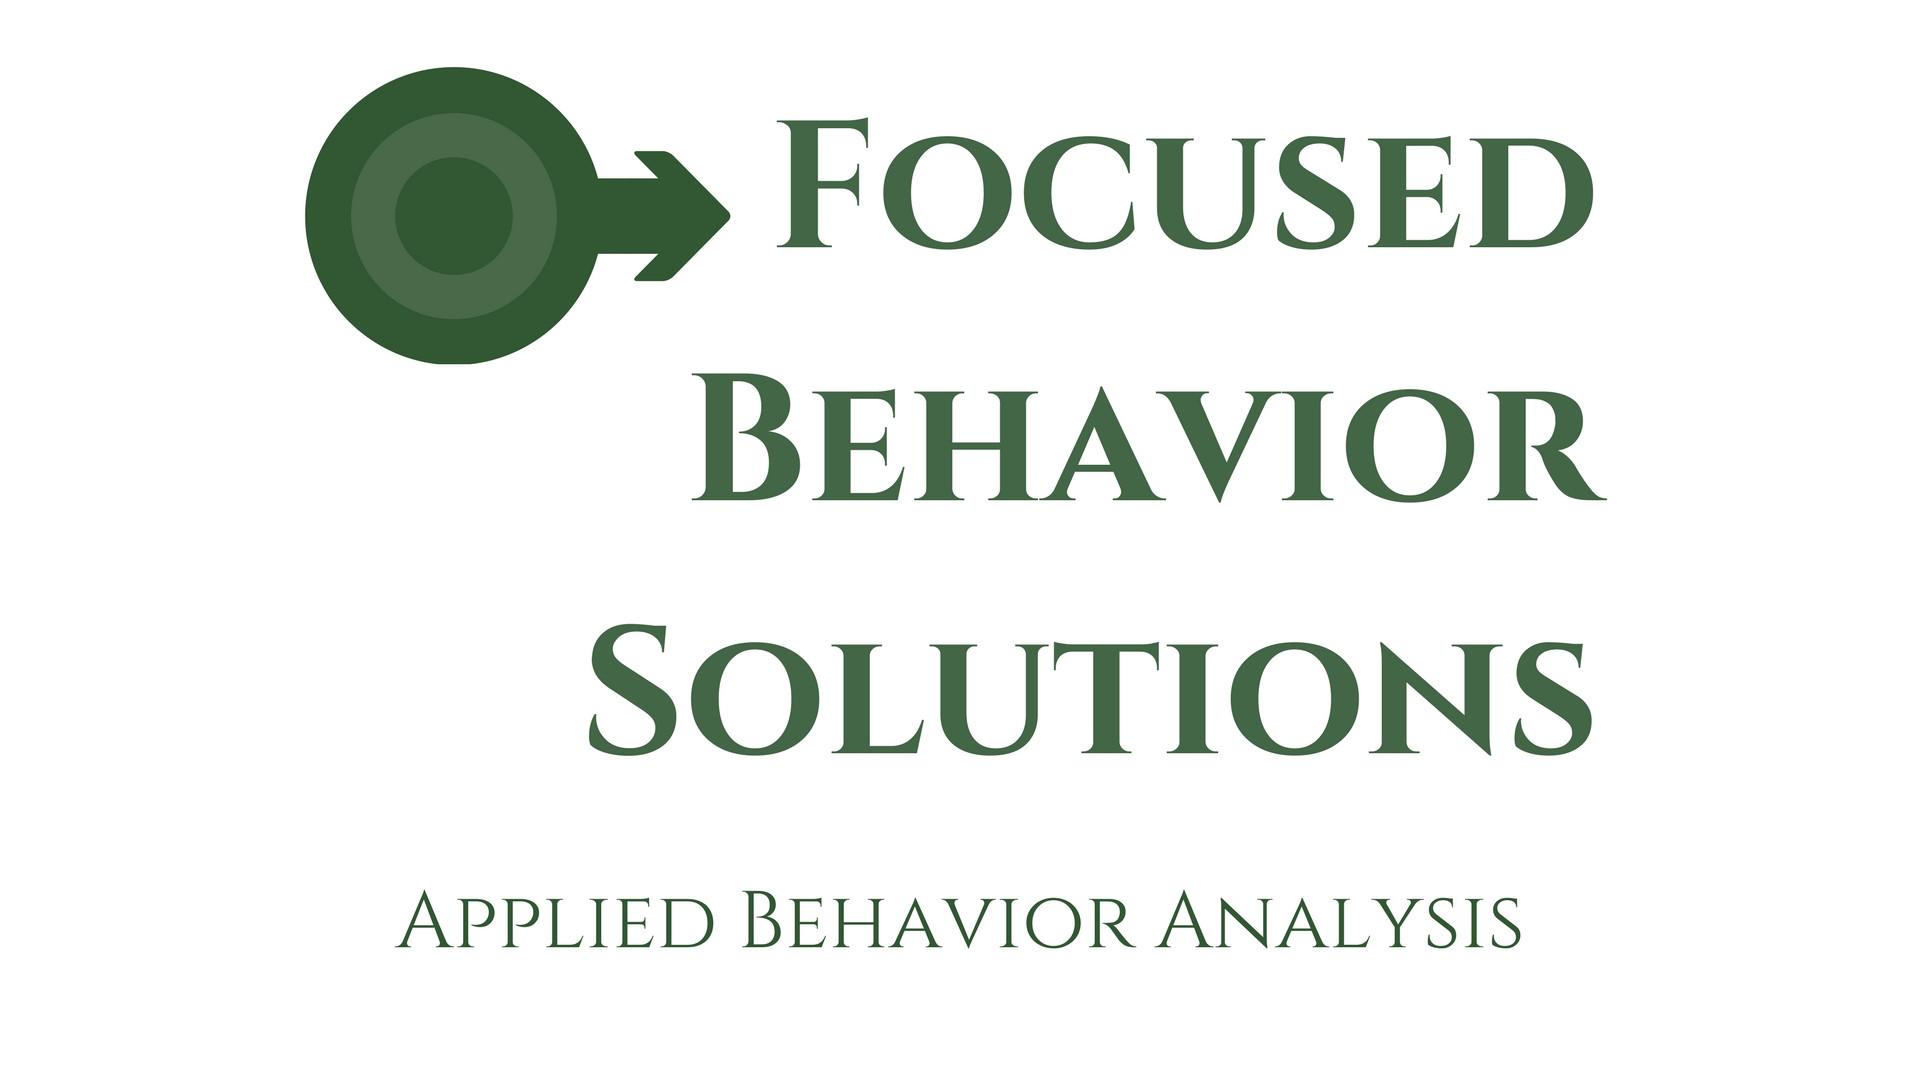 Applied Behavior Analysis | Spokane| Focused Behavior Solutions